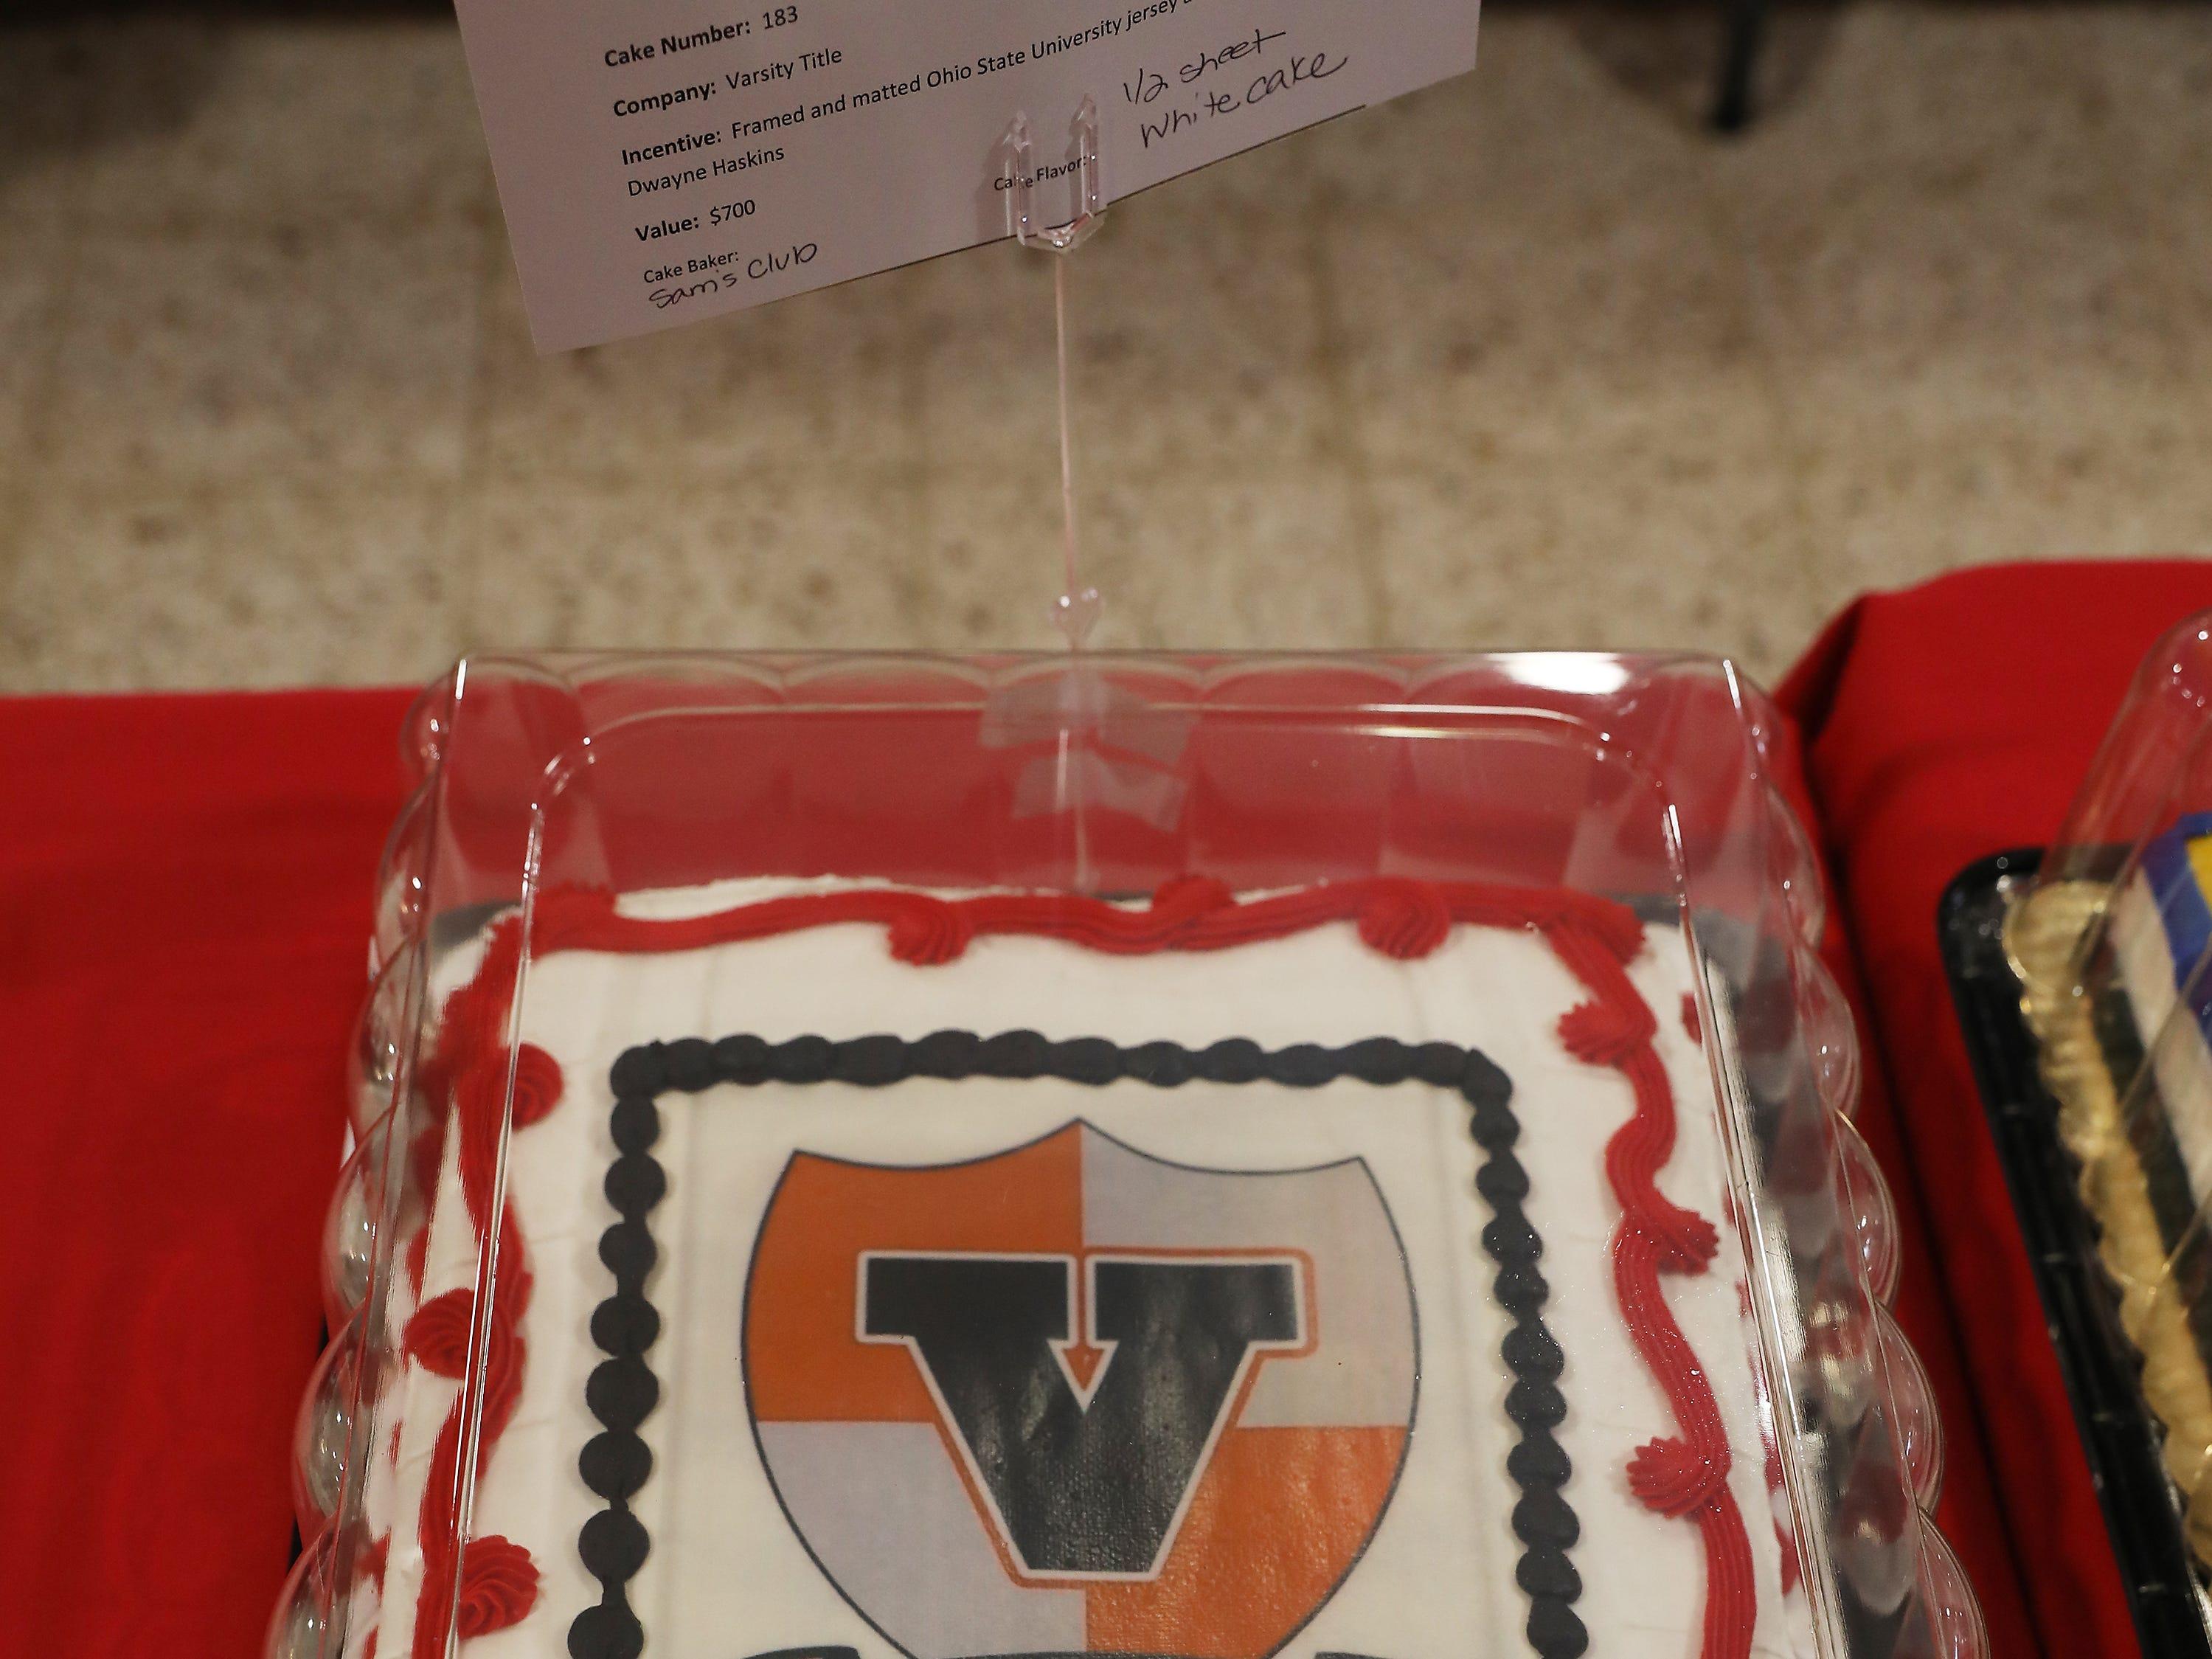 4:45 P.M. Thursday cake 183 Varsity Title - Ohio State University jersey autographed by Dwayne Haskins; $700